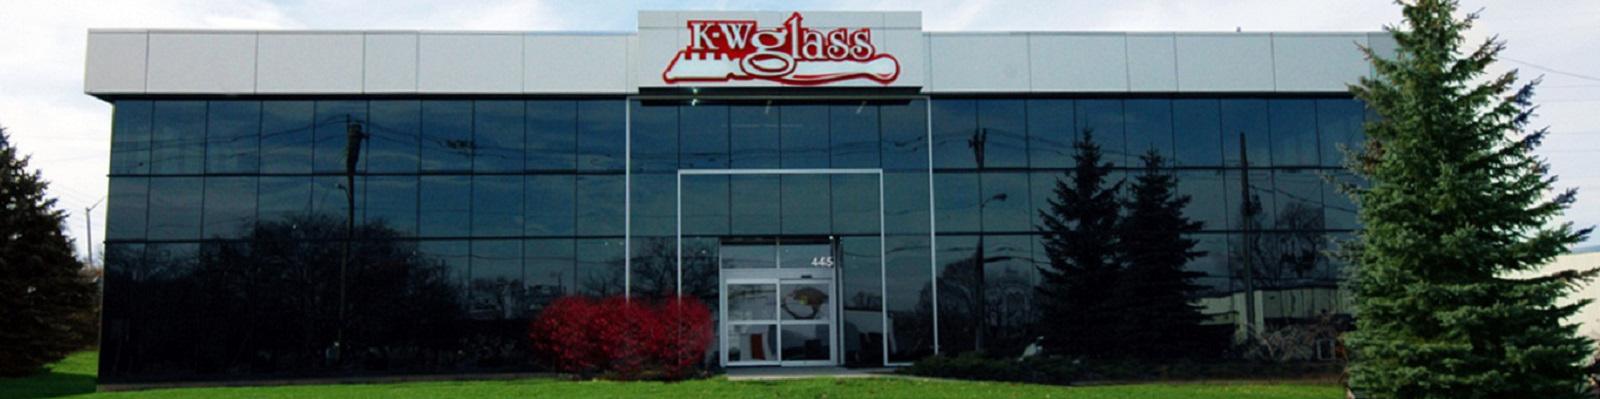 K-W Glass, Waterloo Showroom